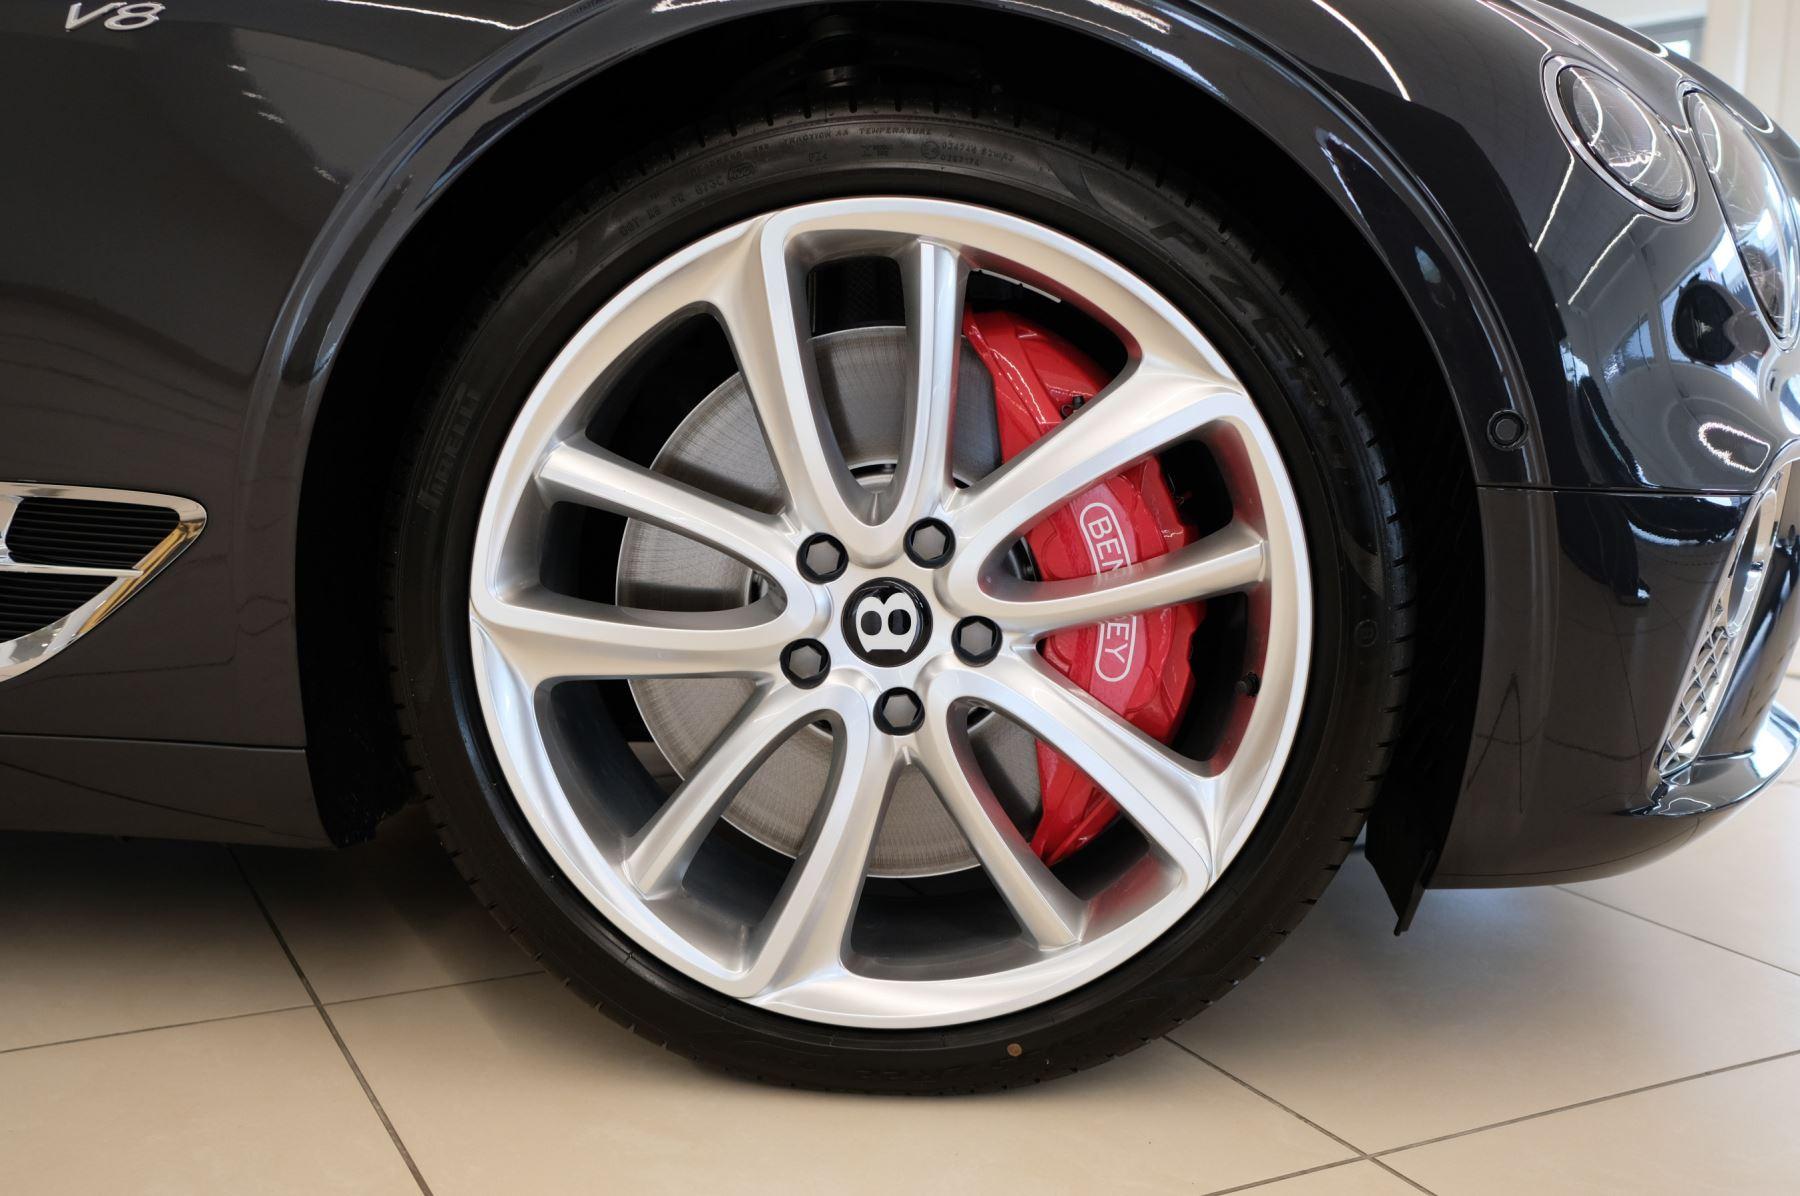 Bentley Continental GT 4.0 V8 2dr Auto image 4